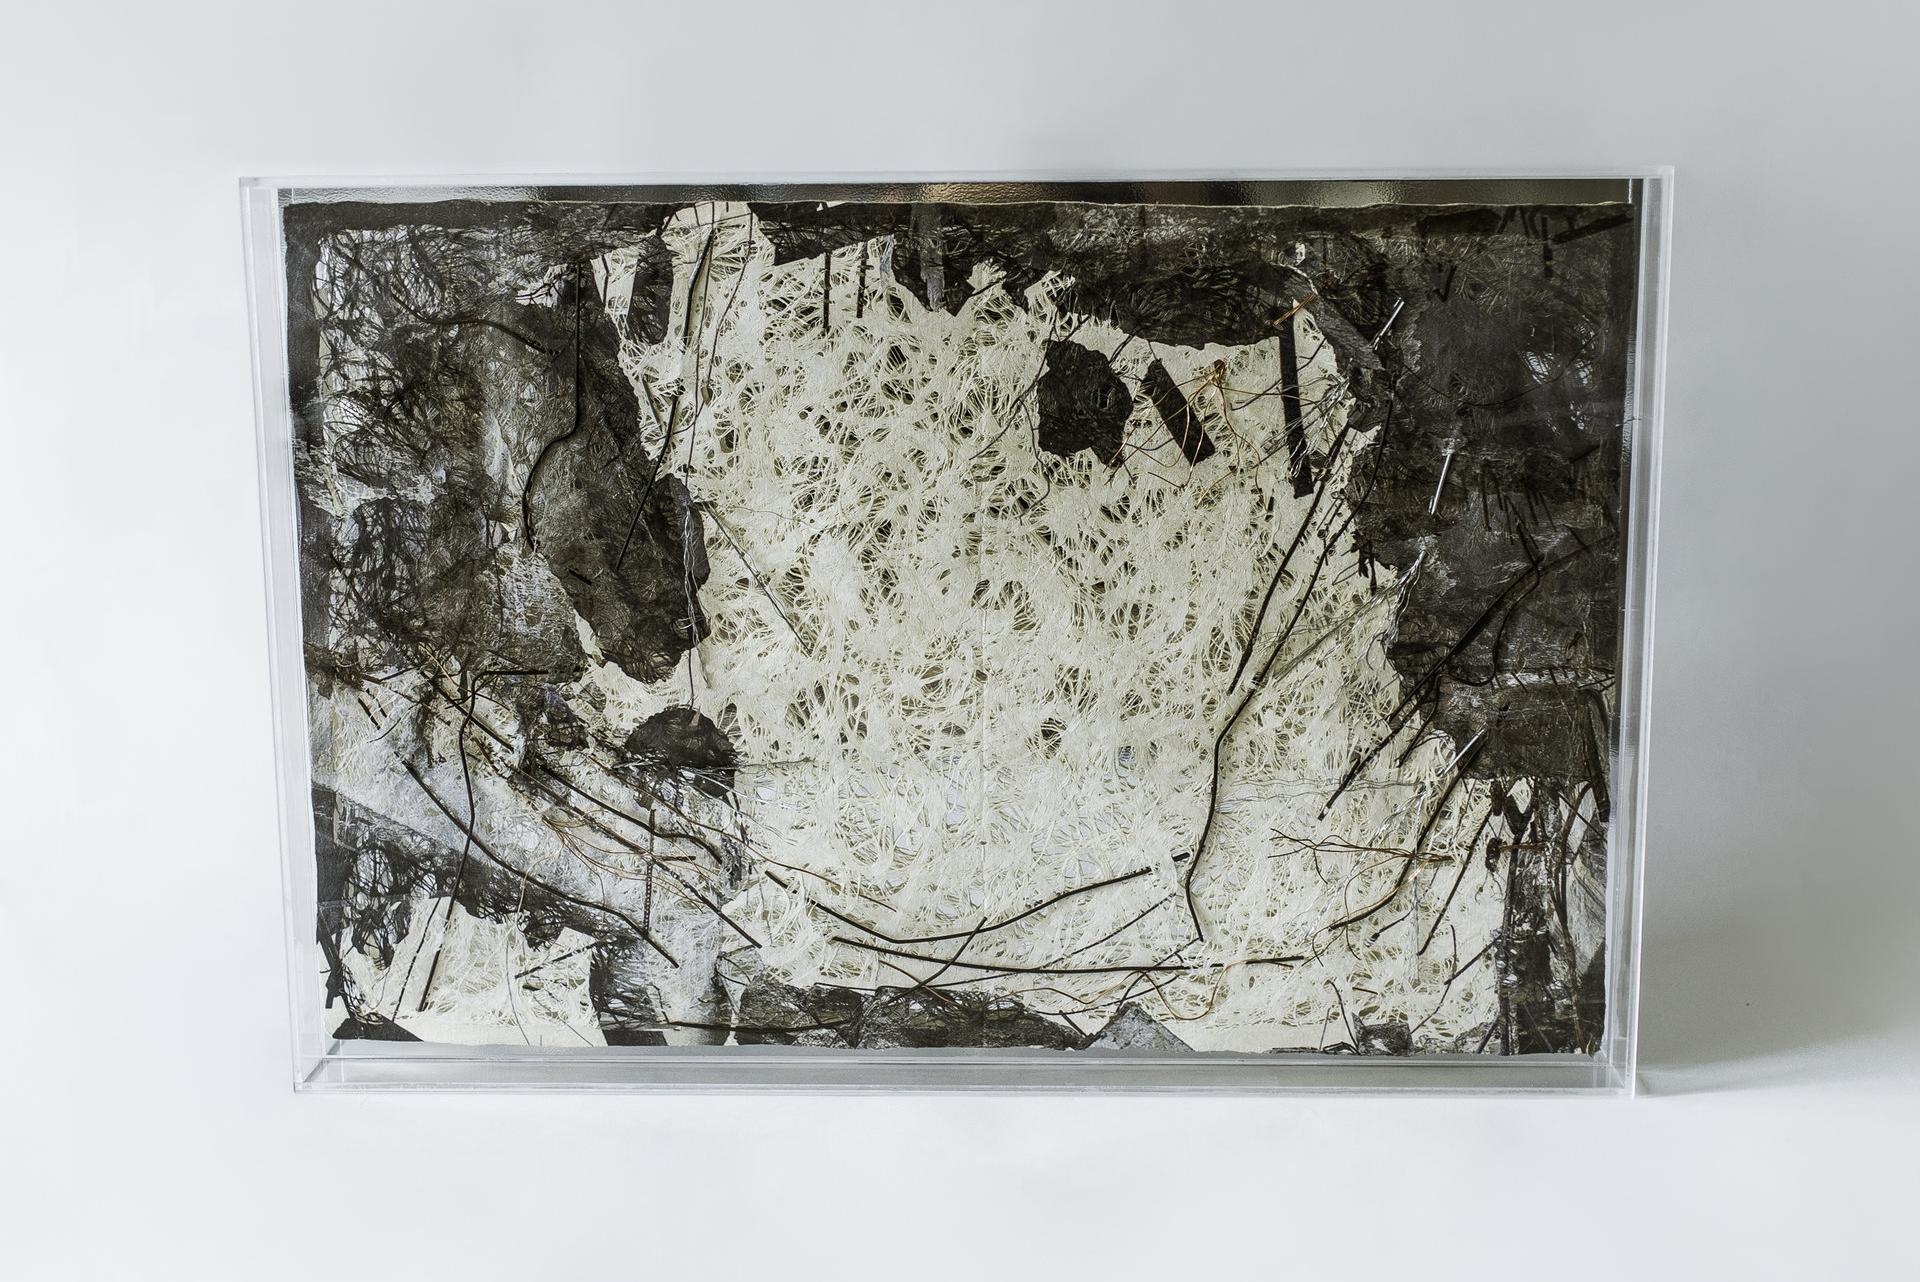 S.T (2018) - 42 x 62 x 4 cm - Acrílico, impresión sobre papel hecho a mano y alambre/ Plexiglass, print on handmade paper and wires